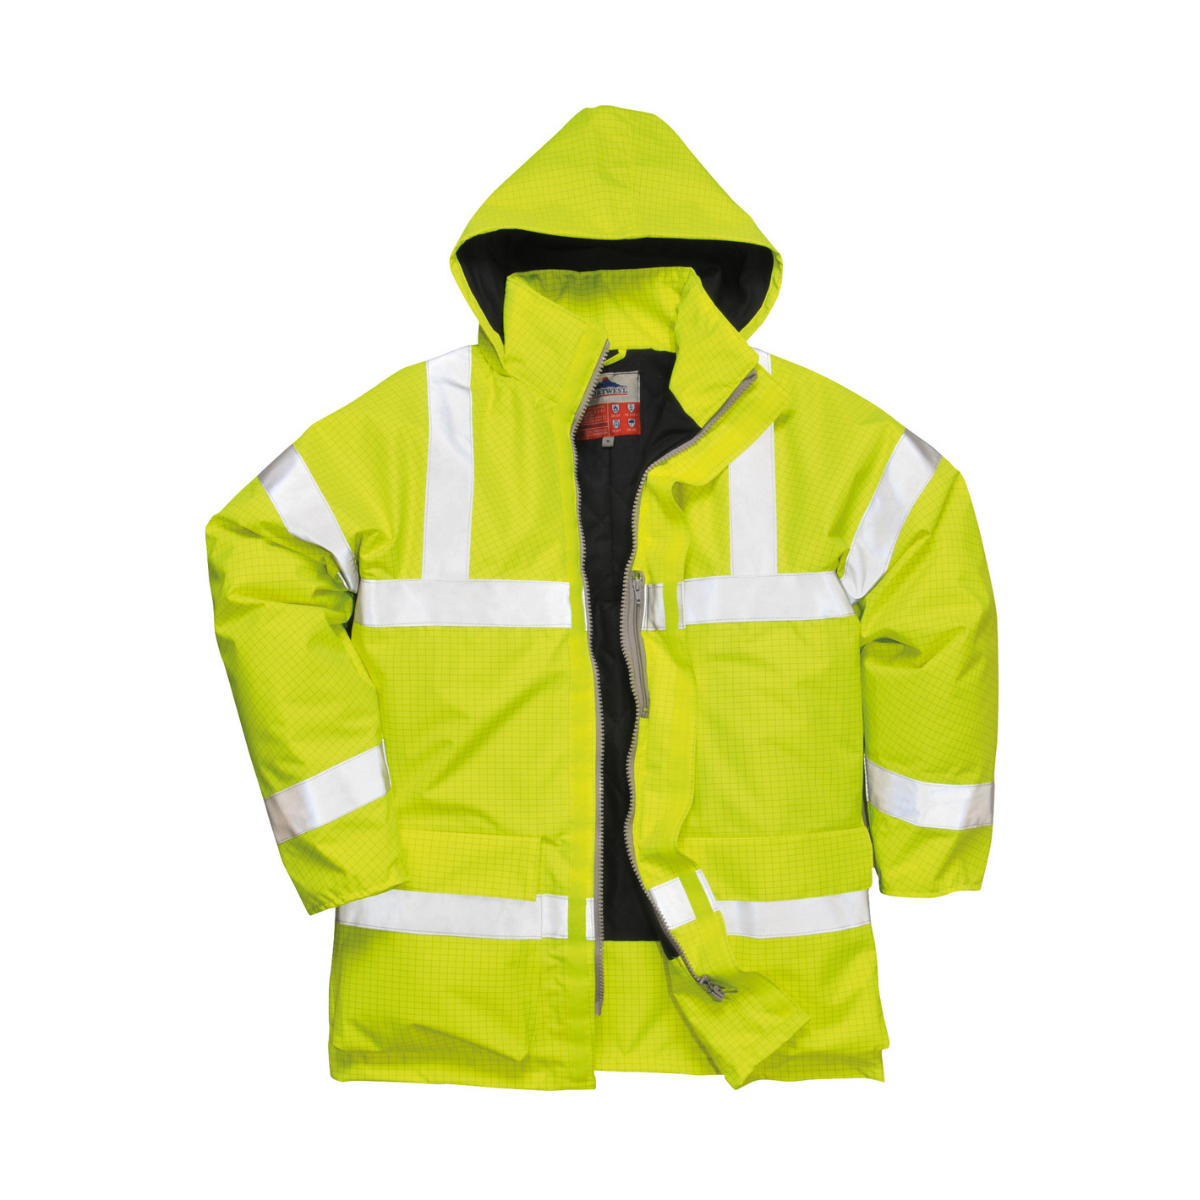 AS0778_FR AS Hi-Vis Contractors Traffic Jacket_Yellow